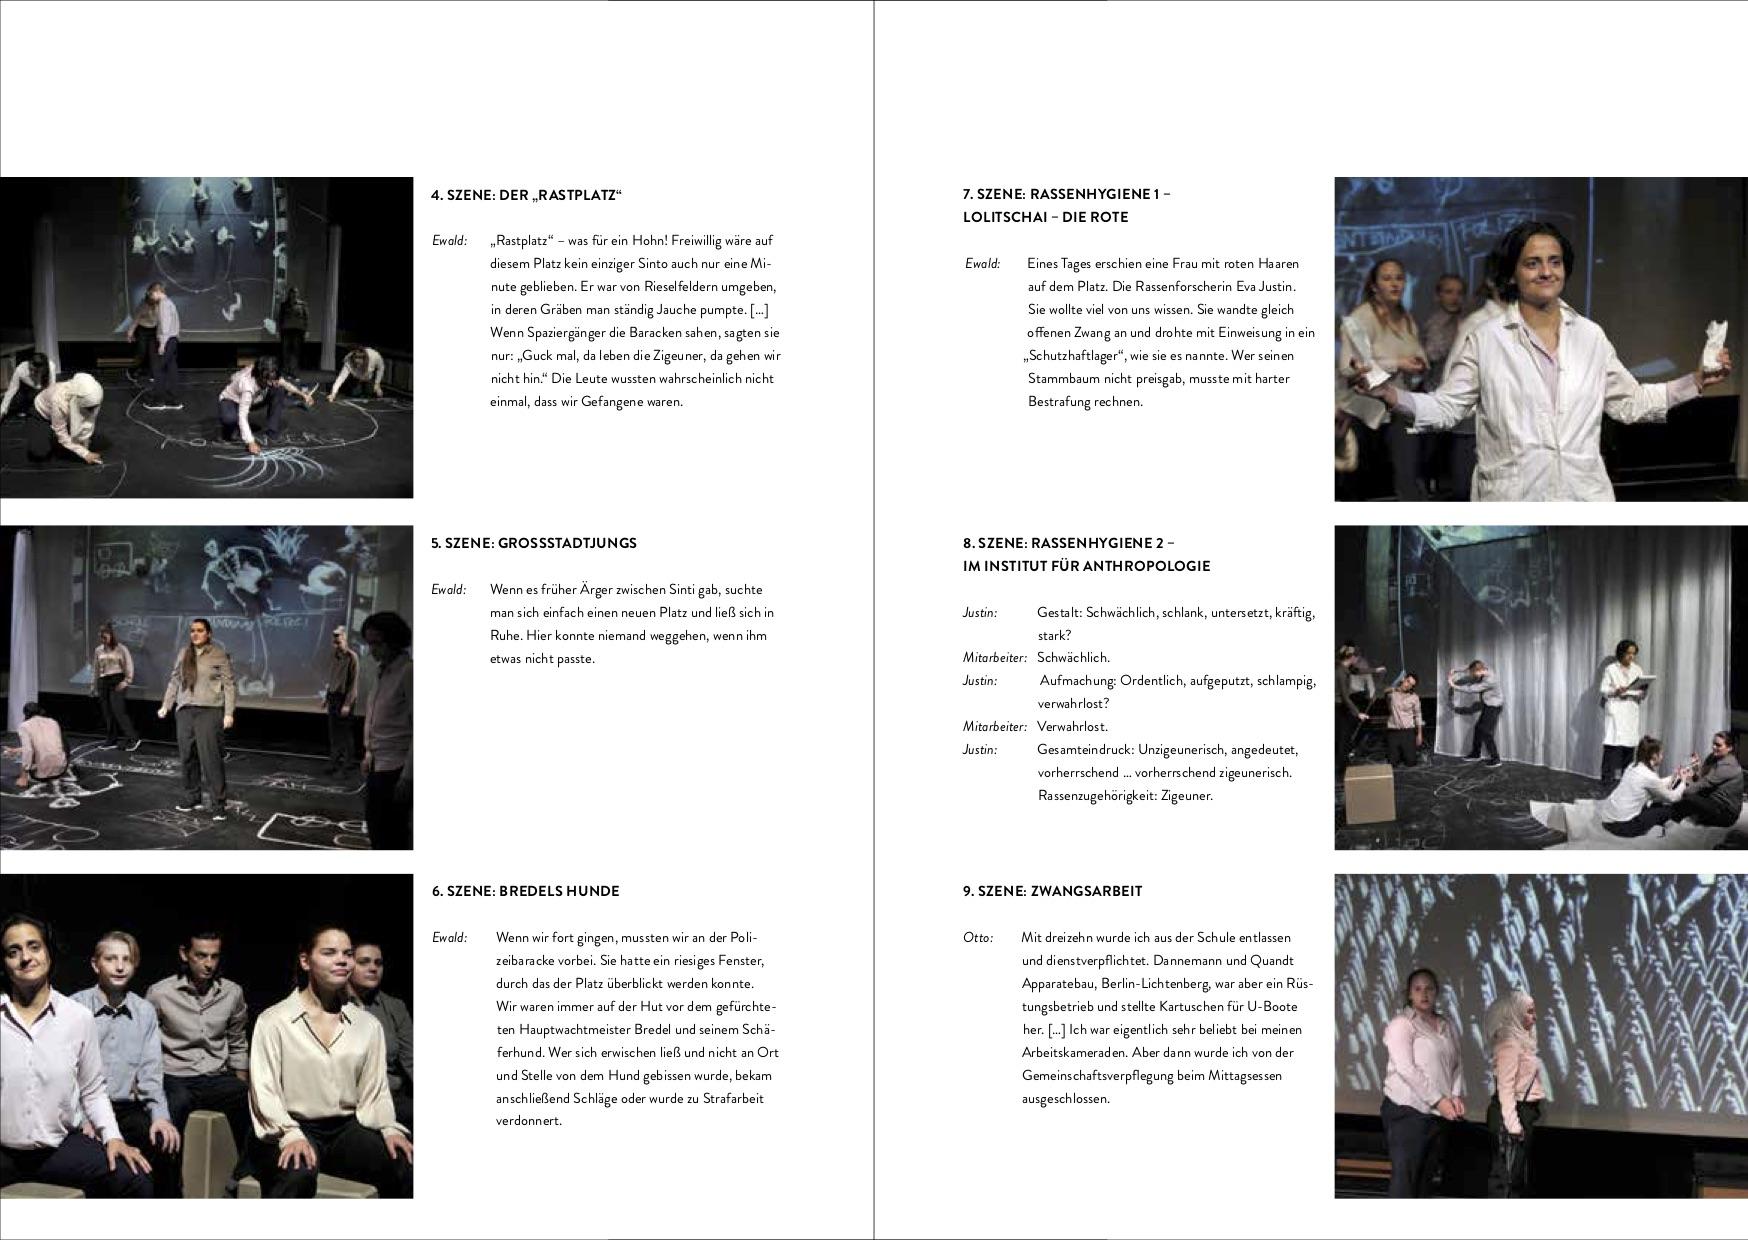 Doku-Broschüre_spreeagenten_RAM_Bro_28-Seiter_A5_03_15.12.17_S10+11.jpg